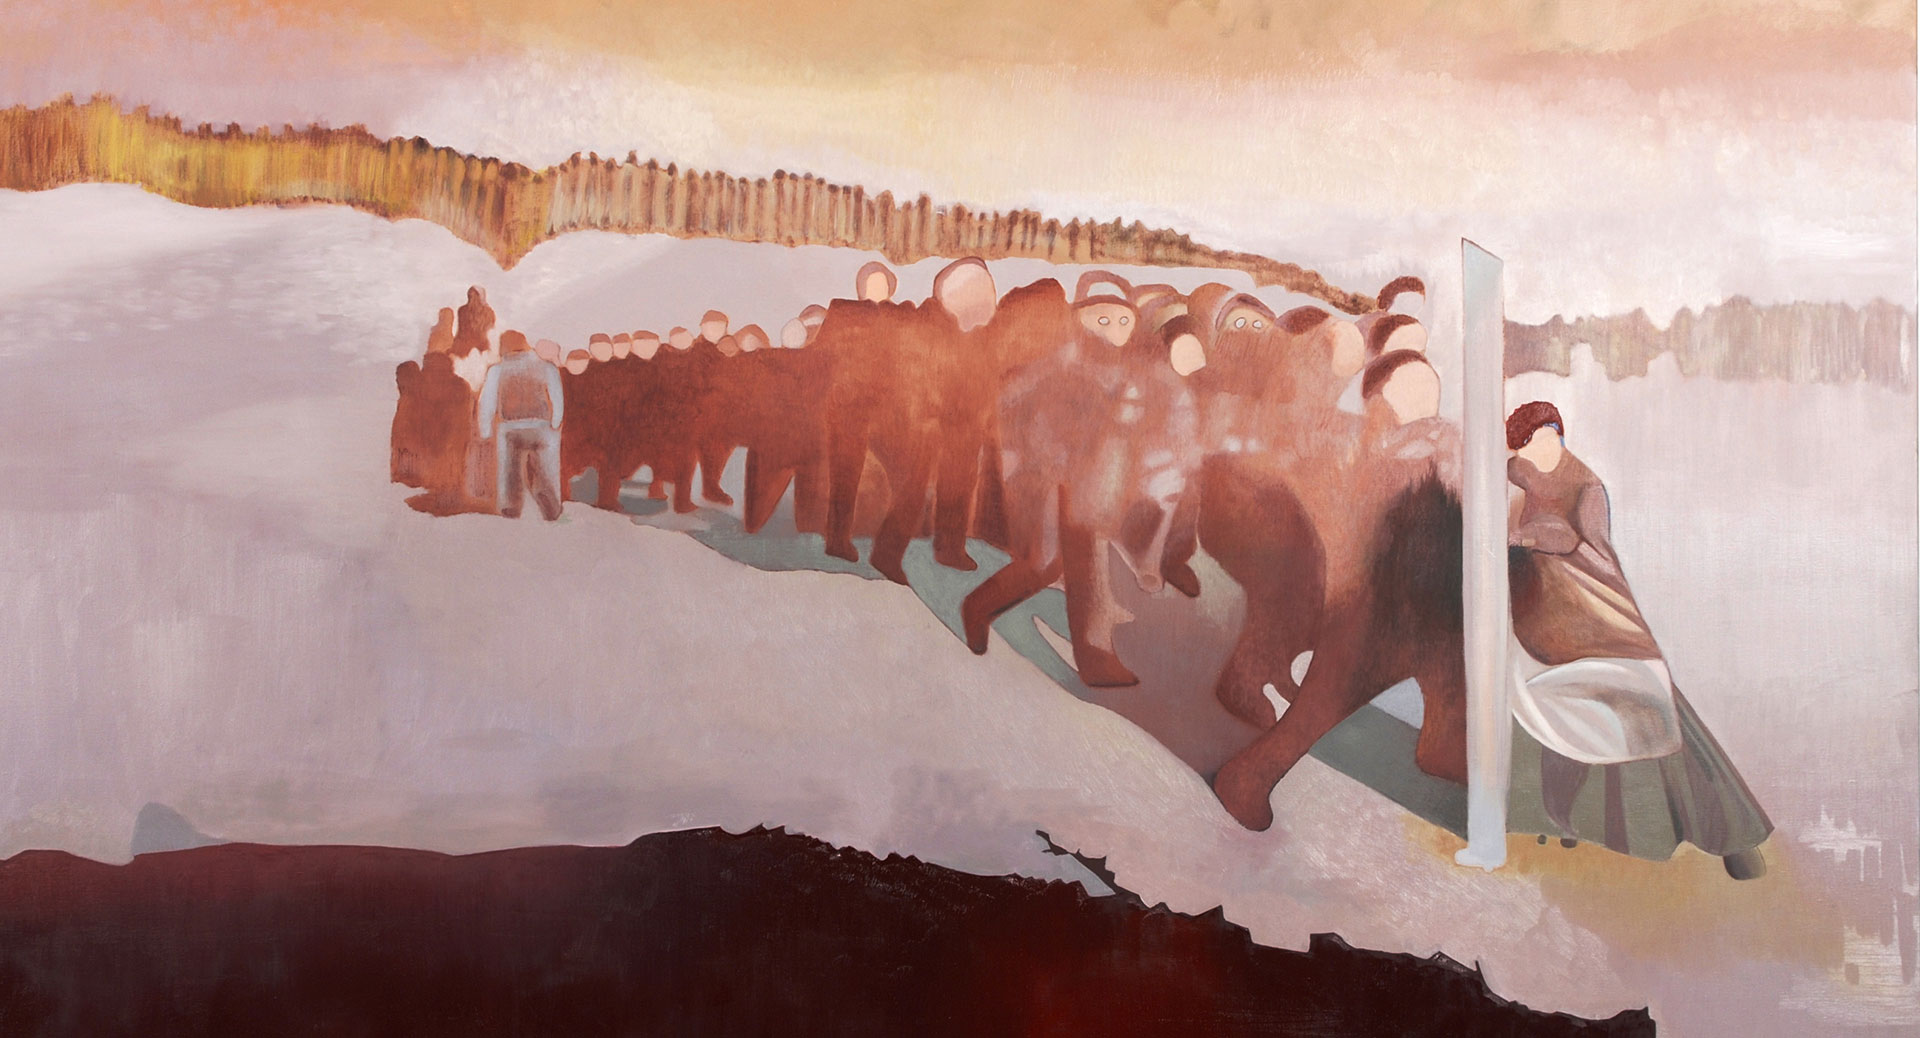 Madeleine Kelly Amona 2008 Oil on linen 150 x 240 cm